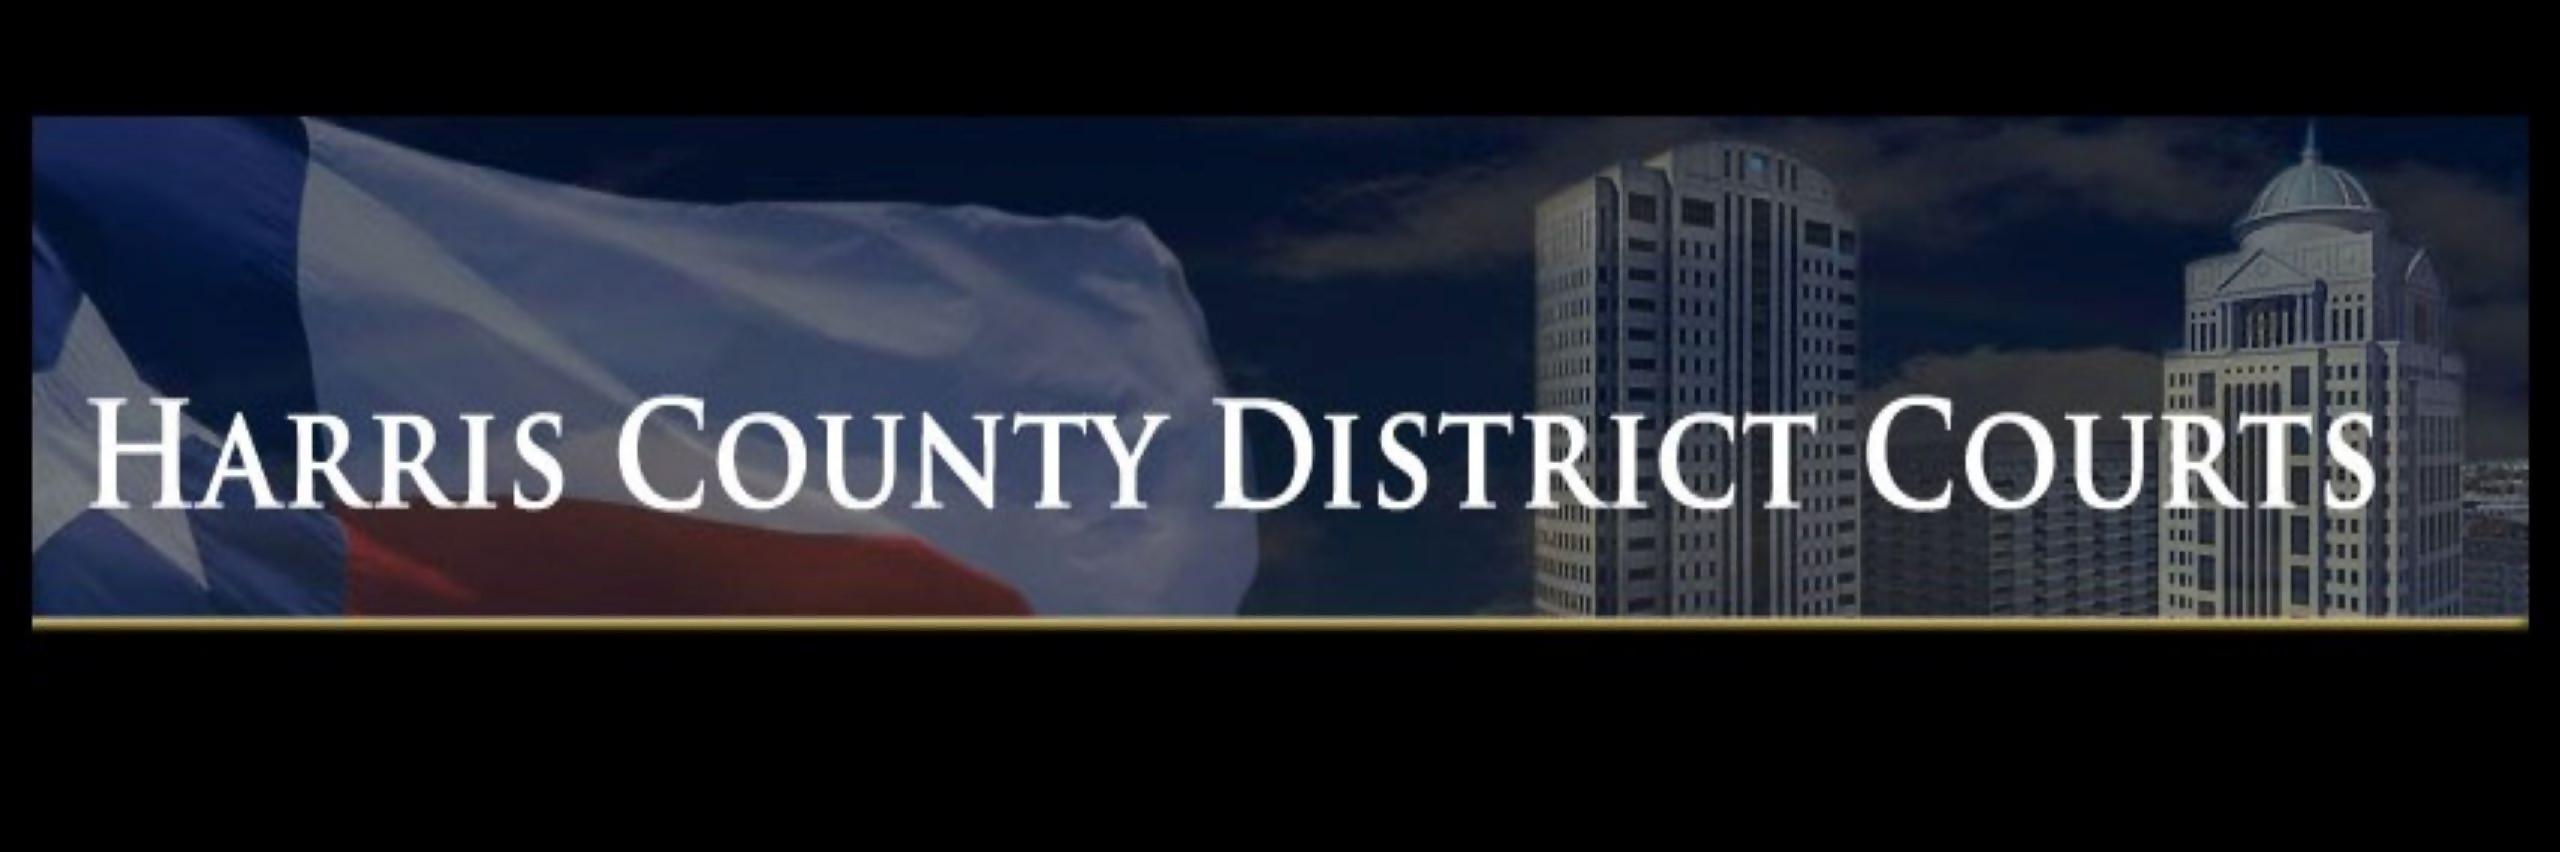 309th District Court AJ - Live Stream